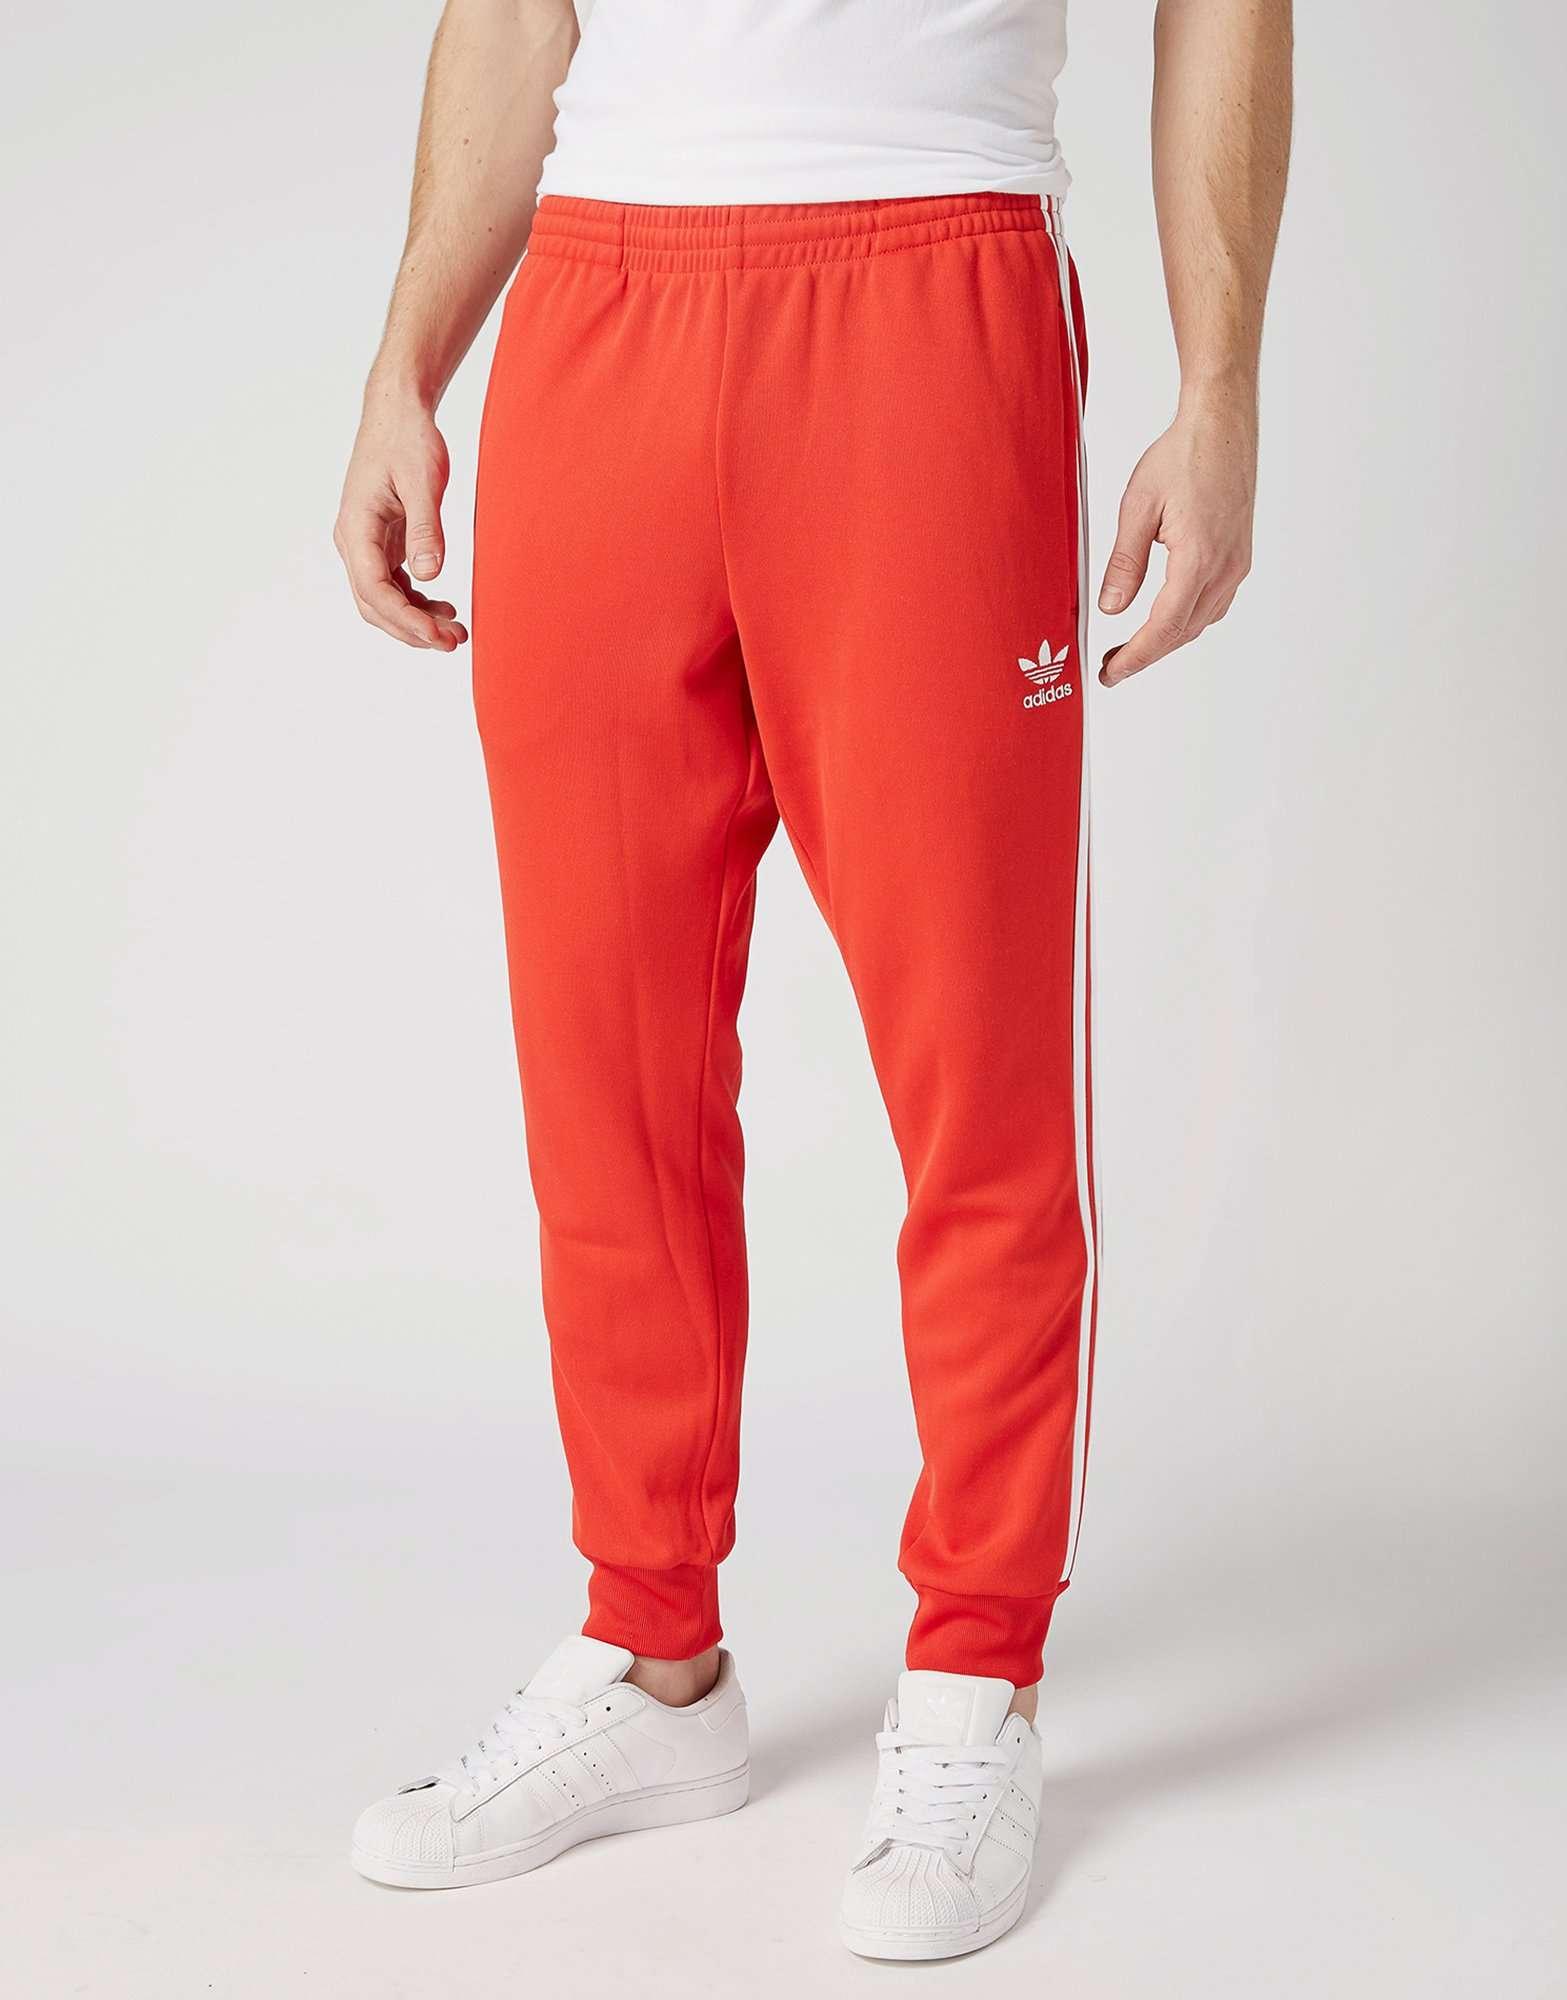 d36bd013f1ad Red Adidas Superstar Cuffed Track Pants